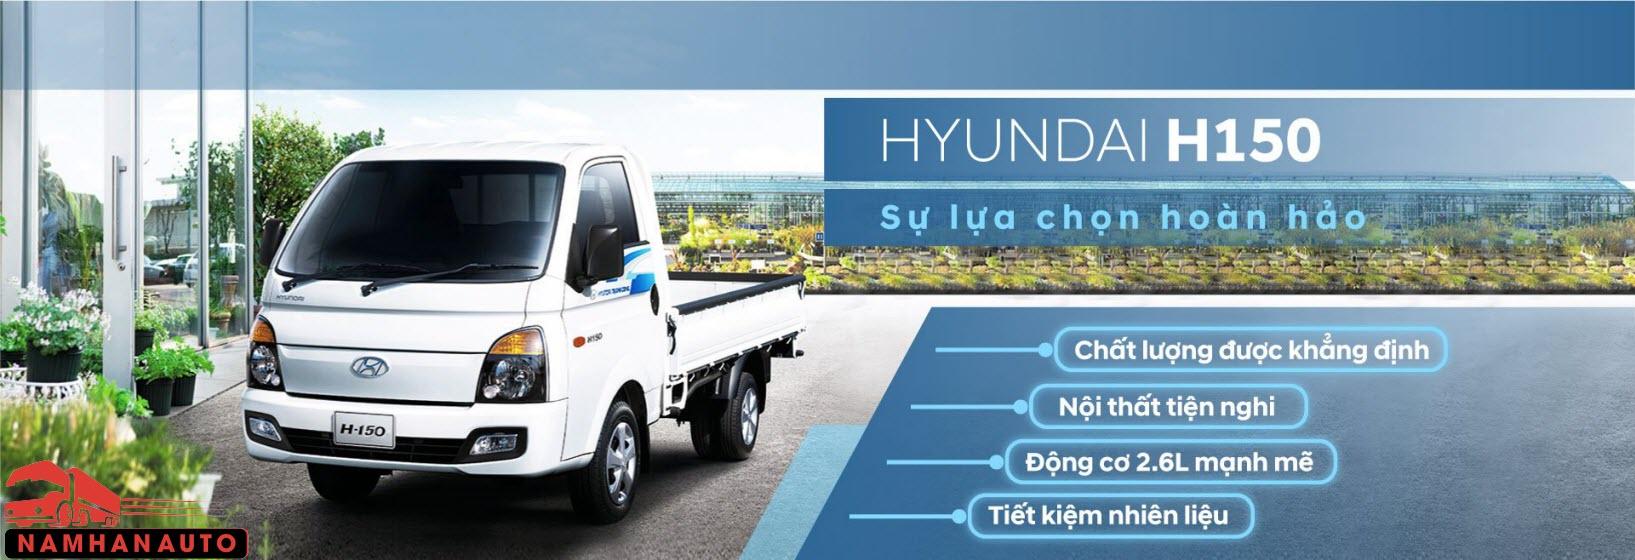 xe-tai-hyundai-h150